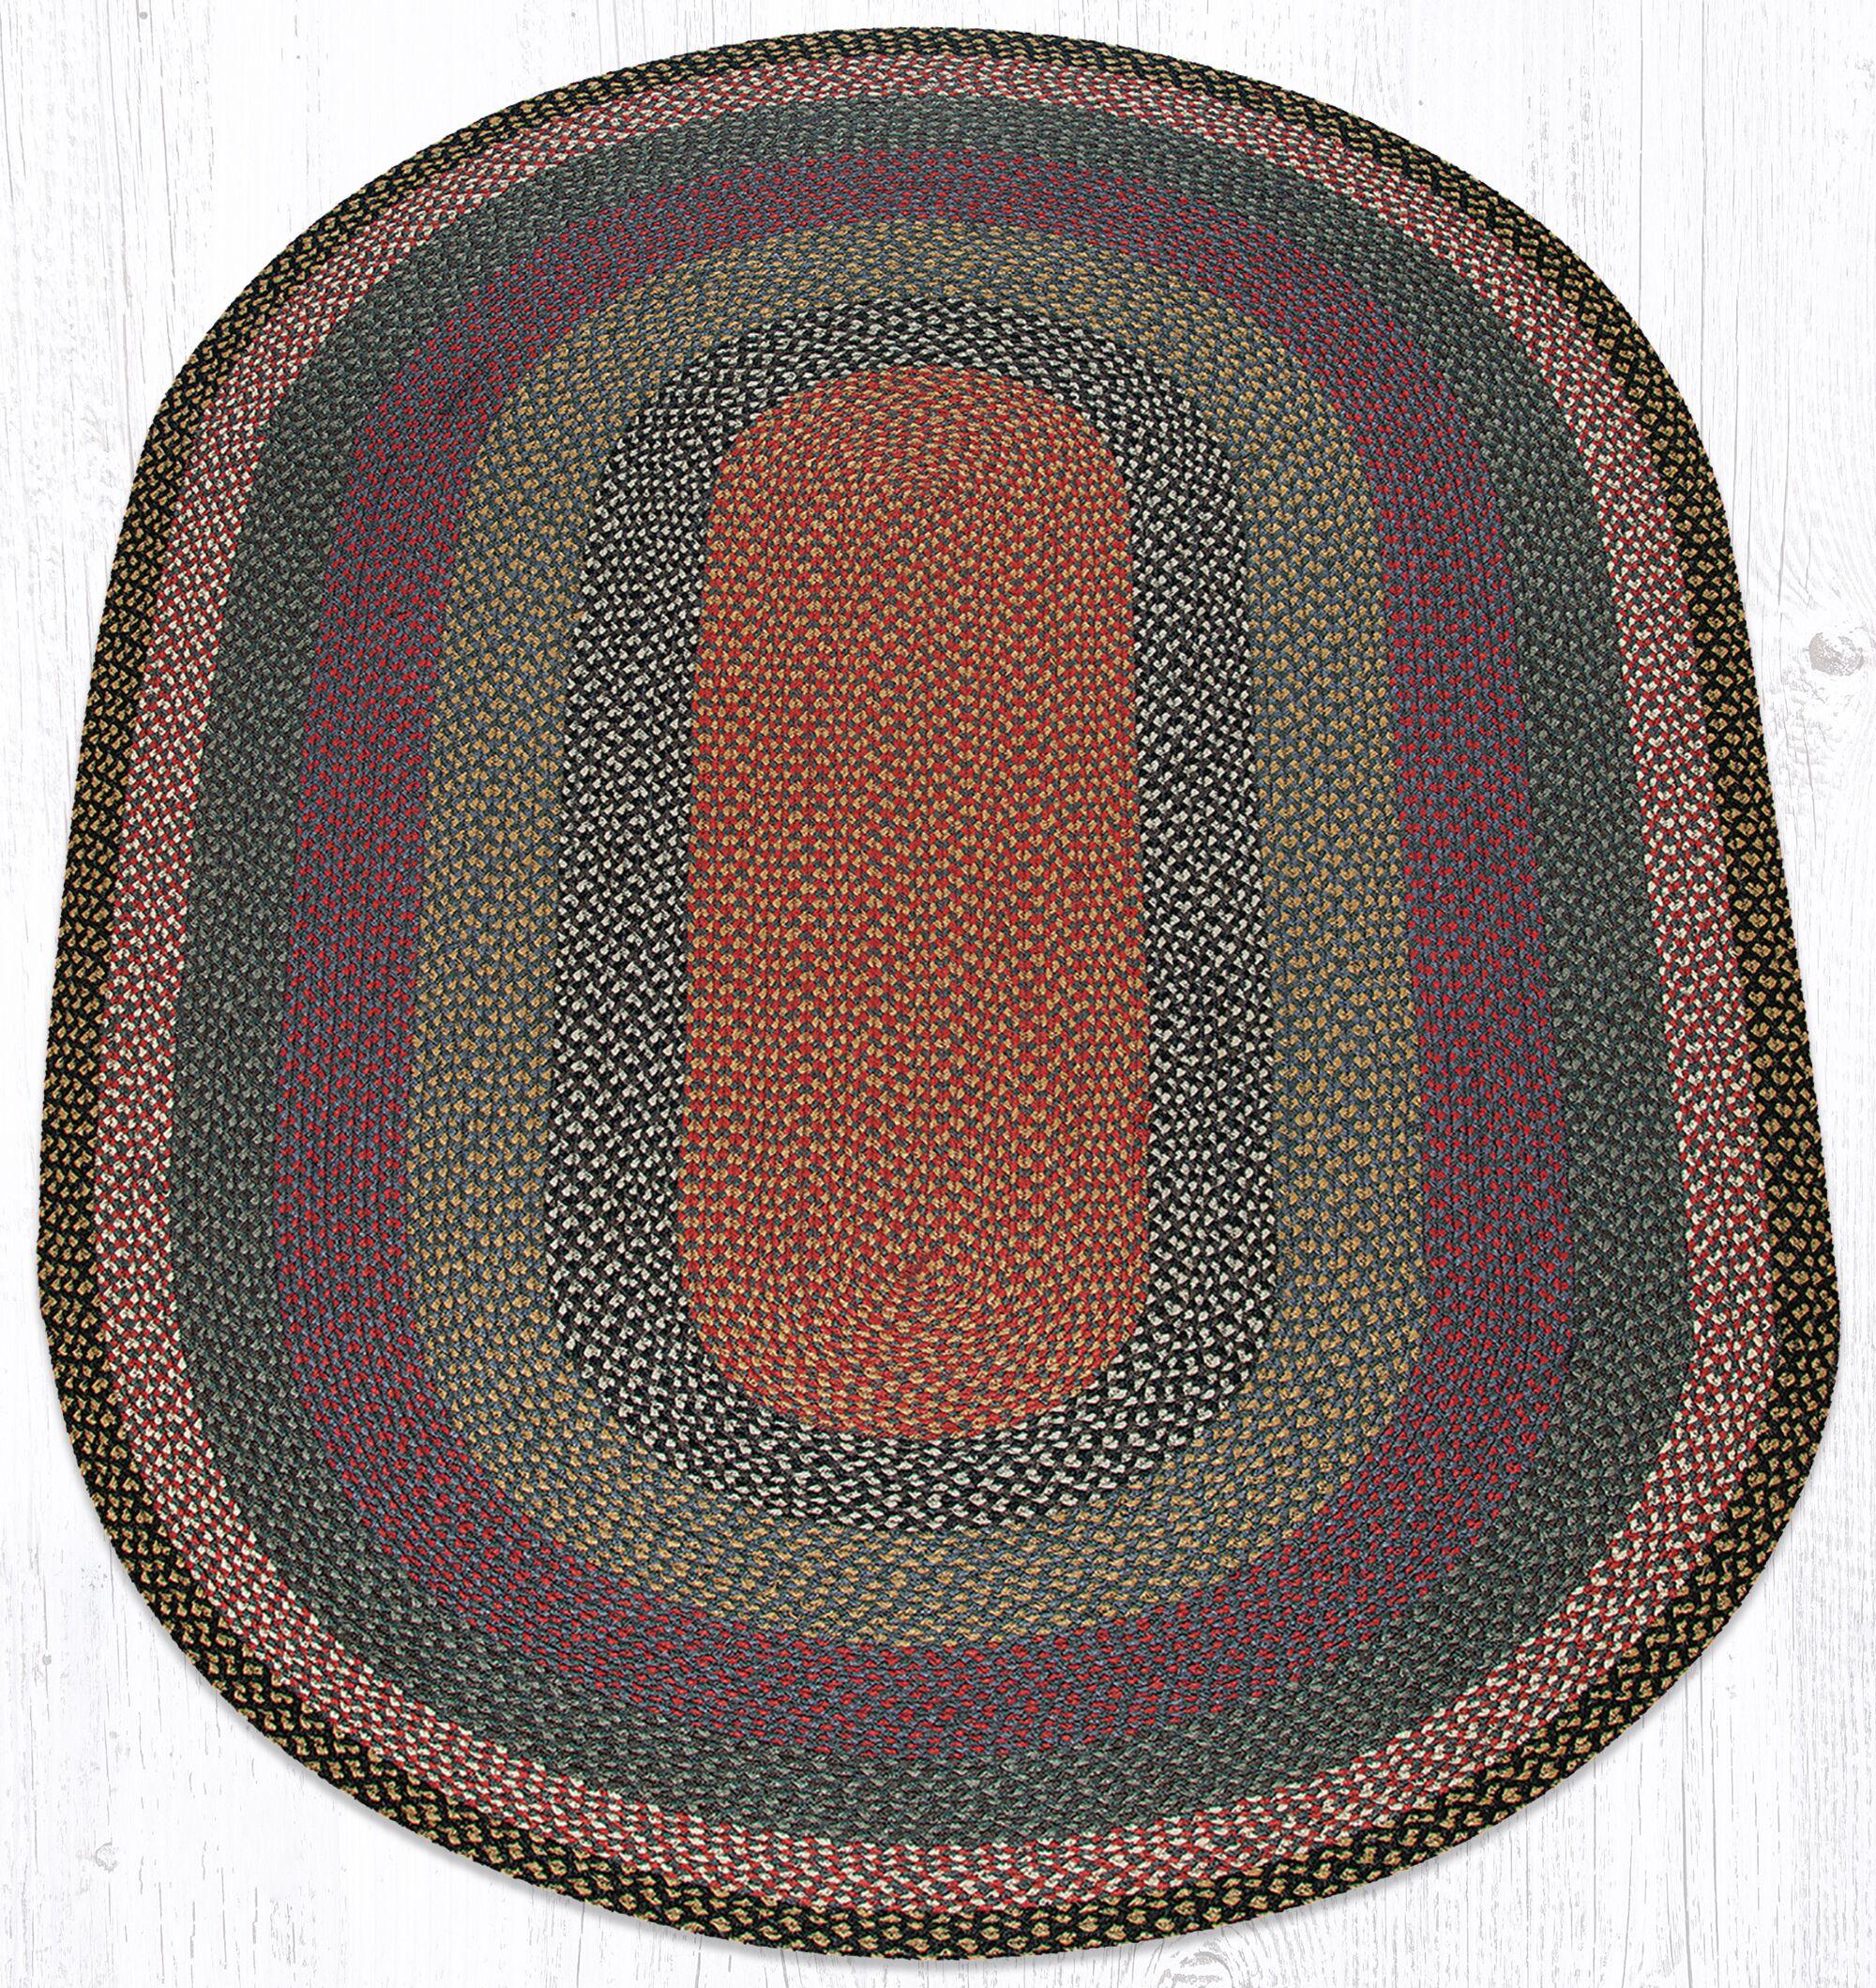 Burgundy/Blue/Gray Braided Area Rug Rug Size: Oval 5' x 8'